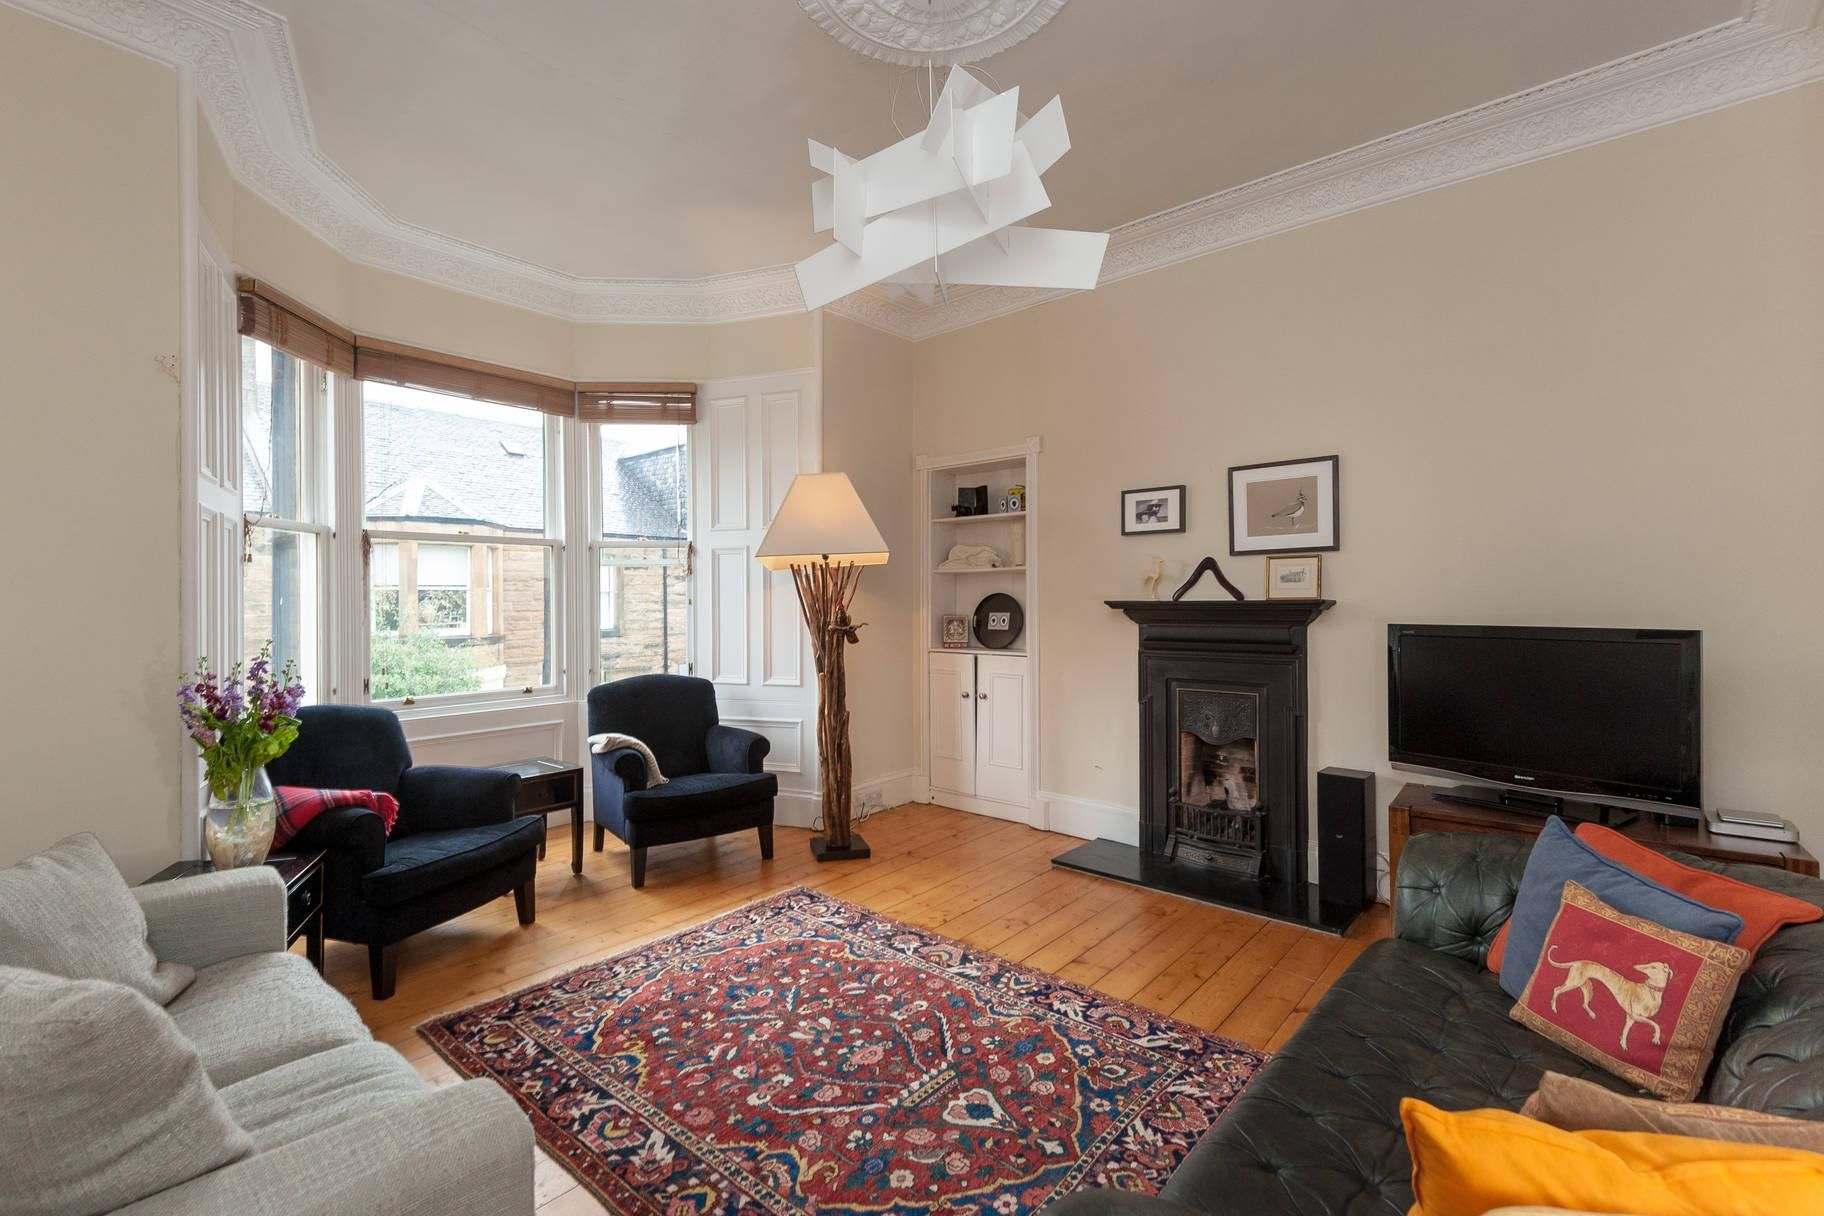 3 Briarbank Terrace, Shandon - Photo 2